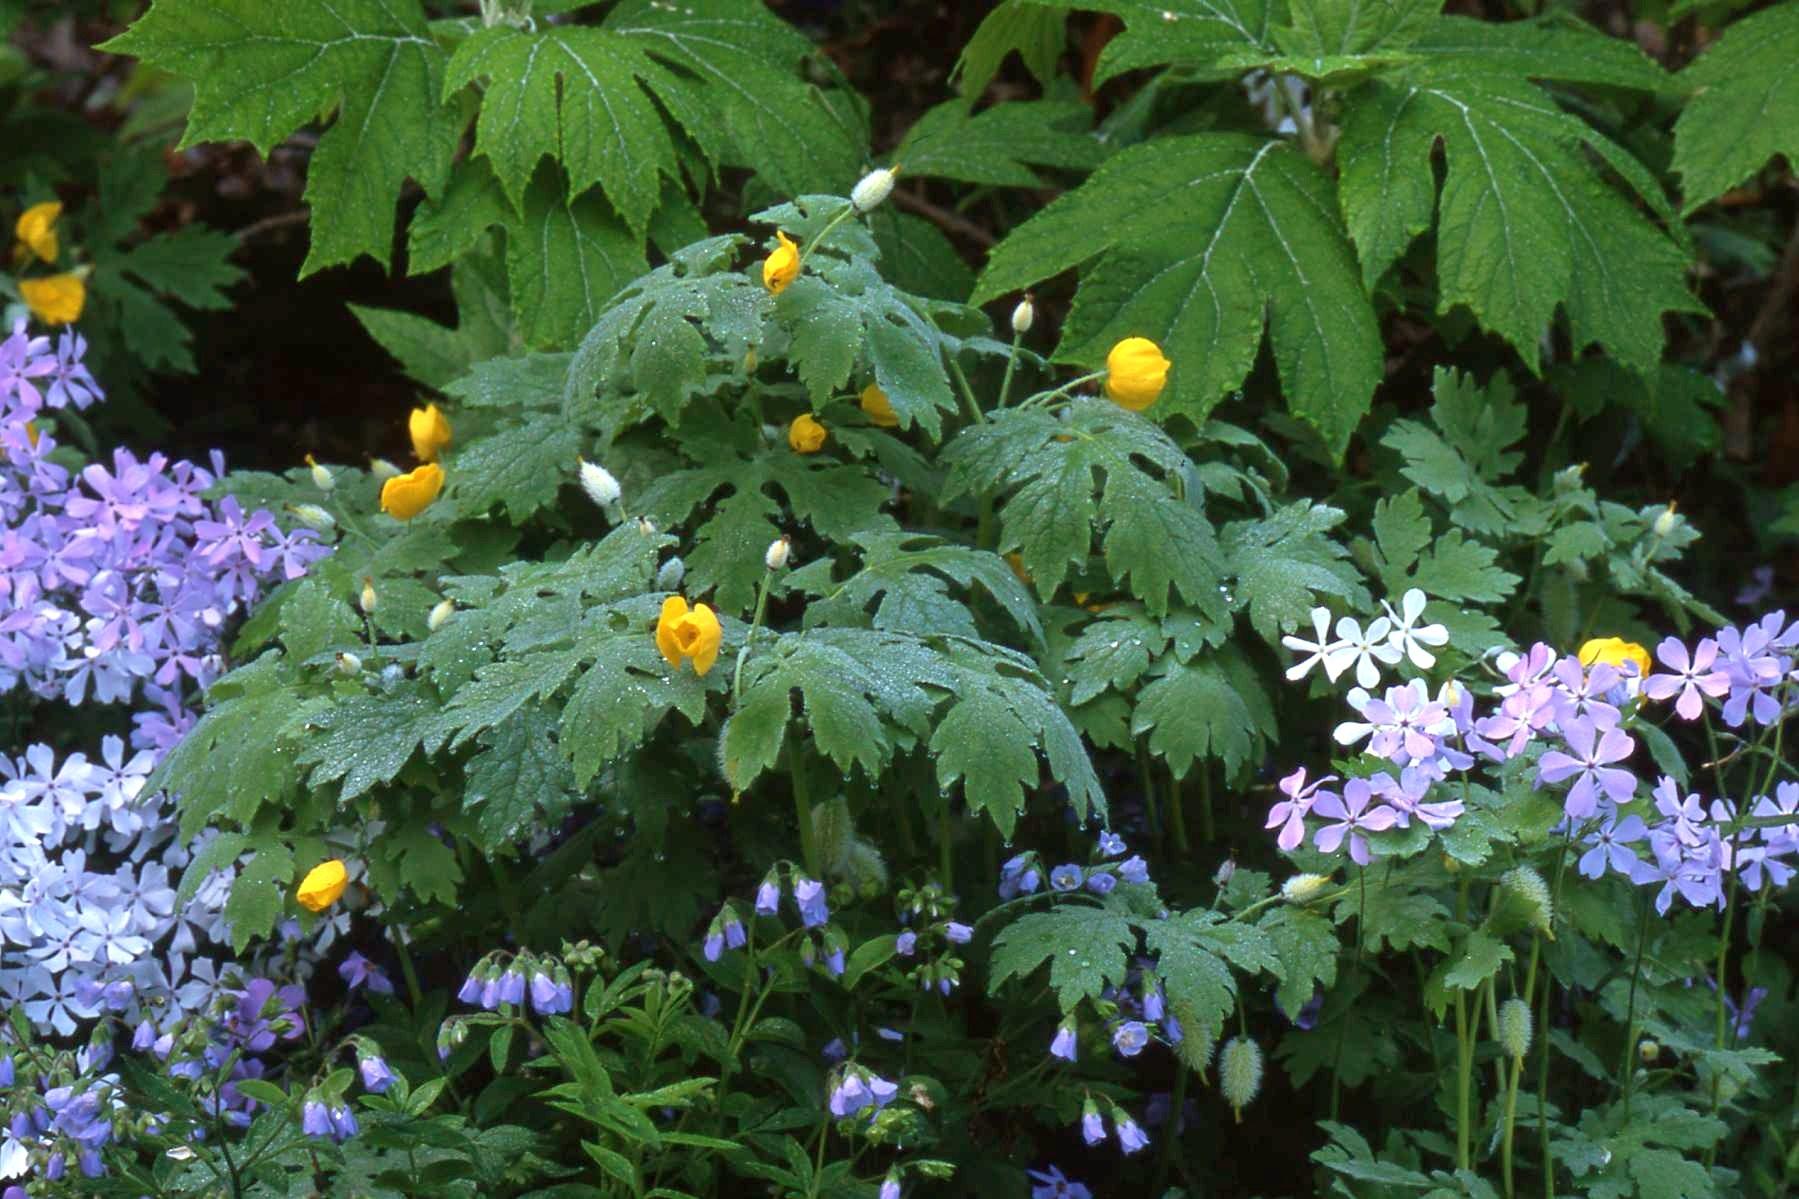 White flowers for shade garden 12 hd wallpaper hdflowerwallpaper white flowers for shade garden free wallpaper mightylinksfo